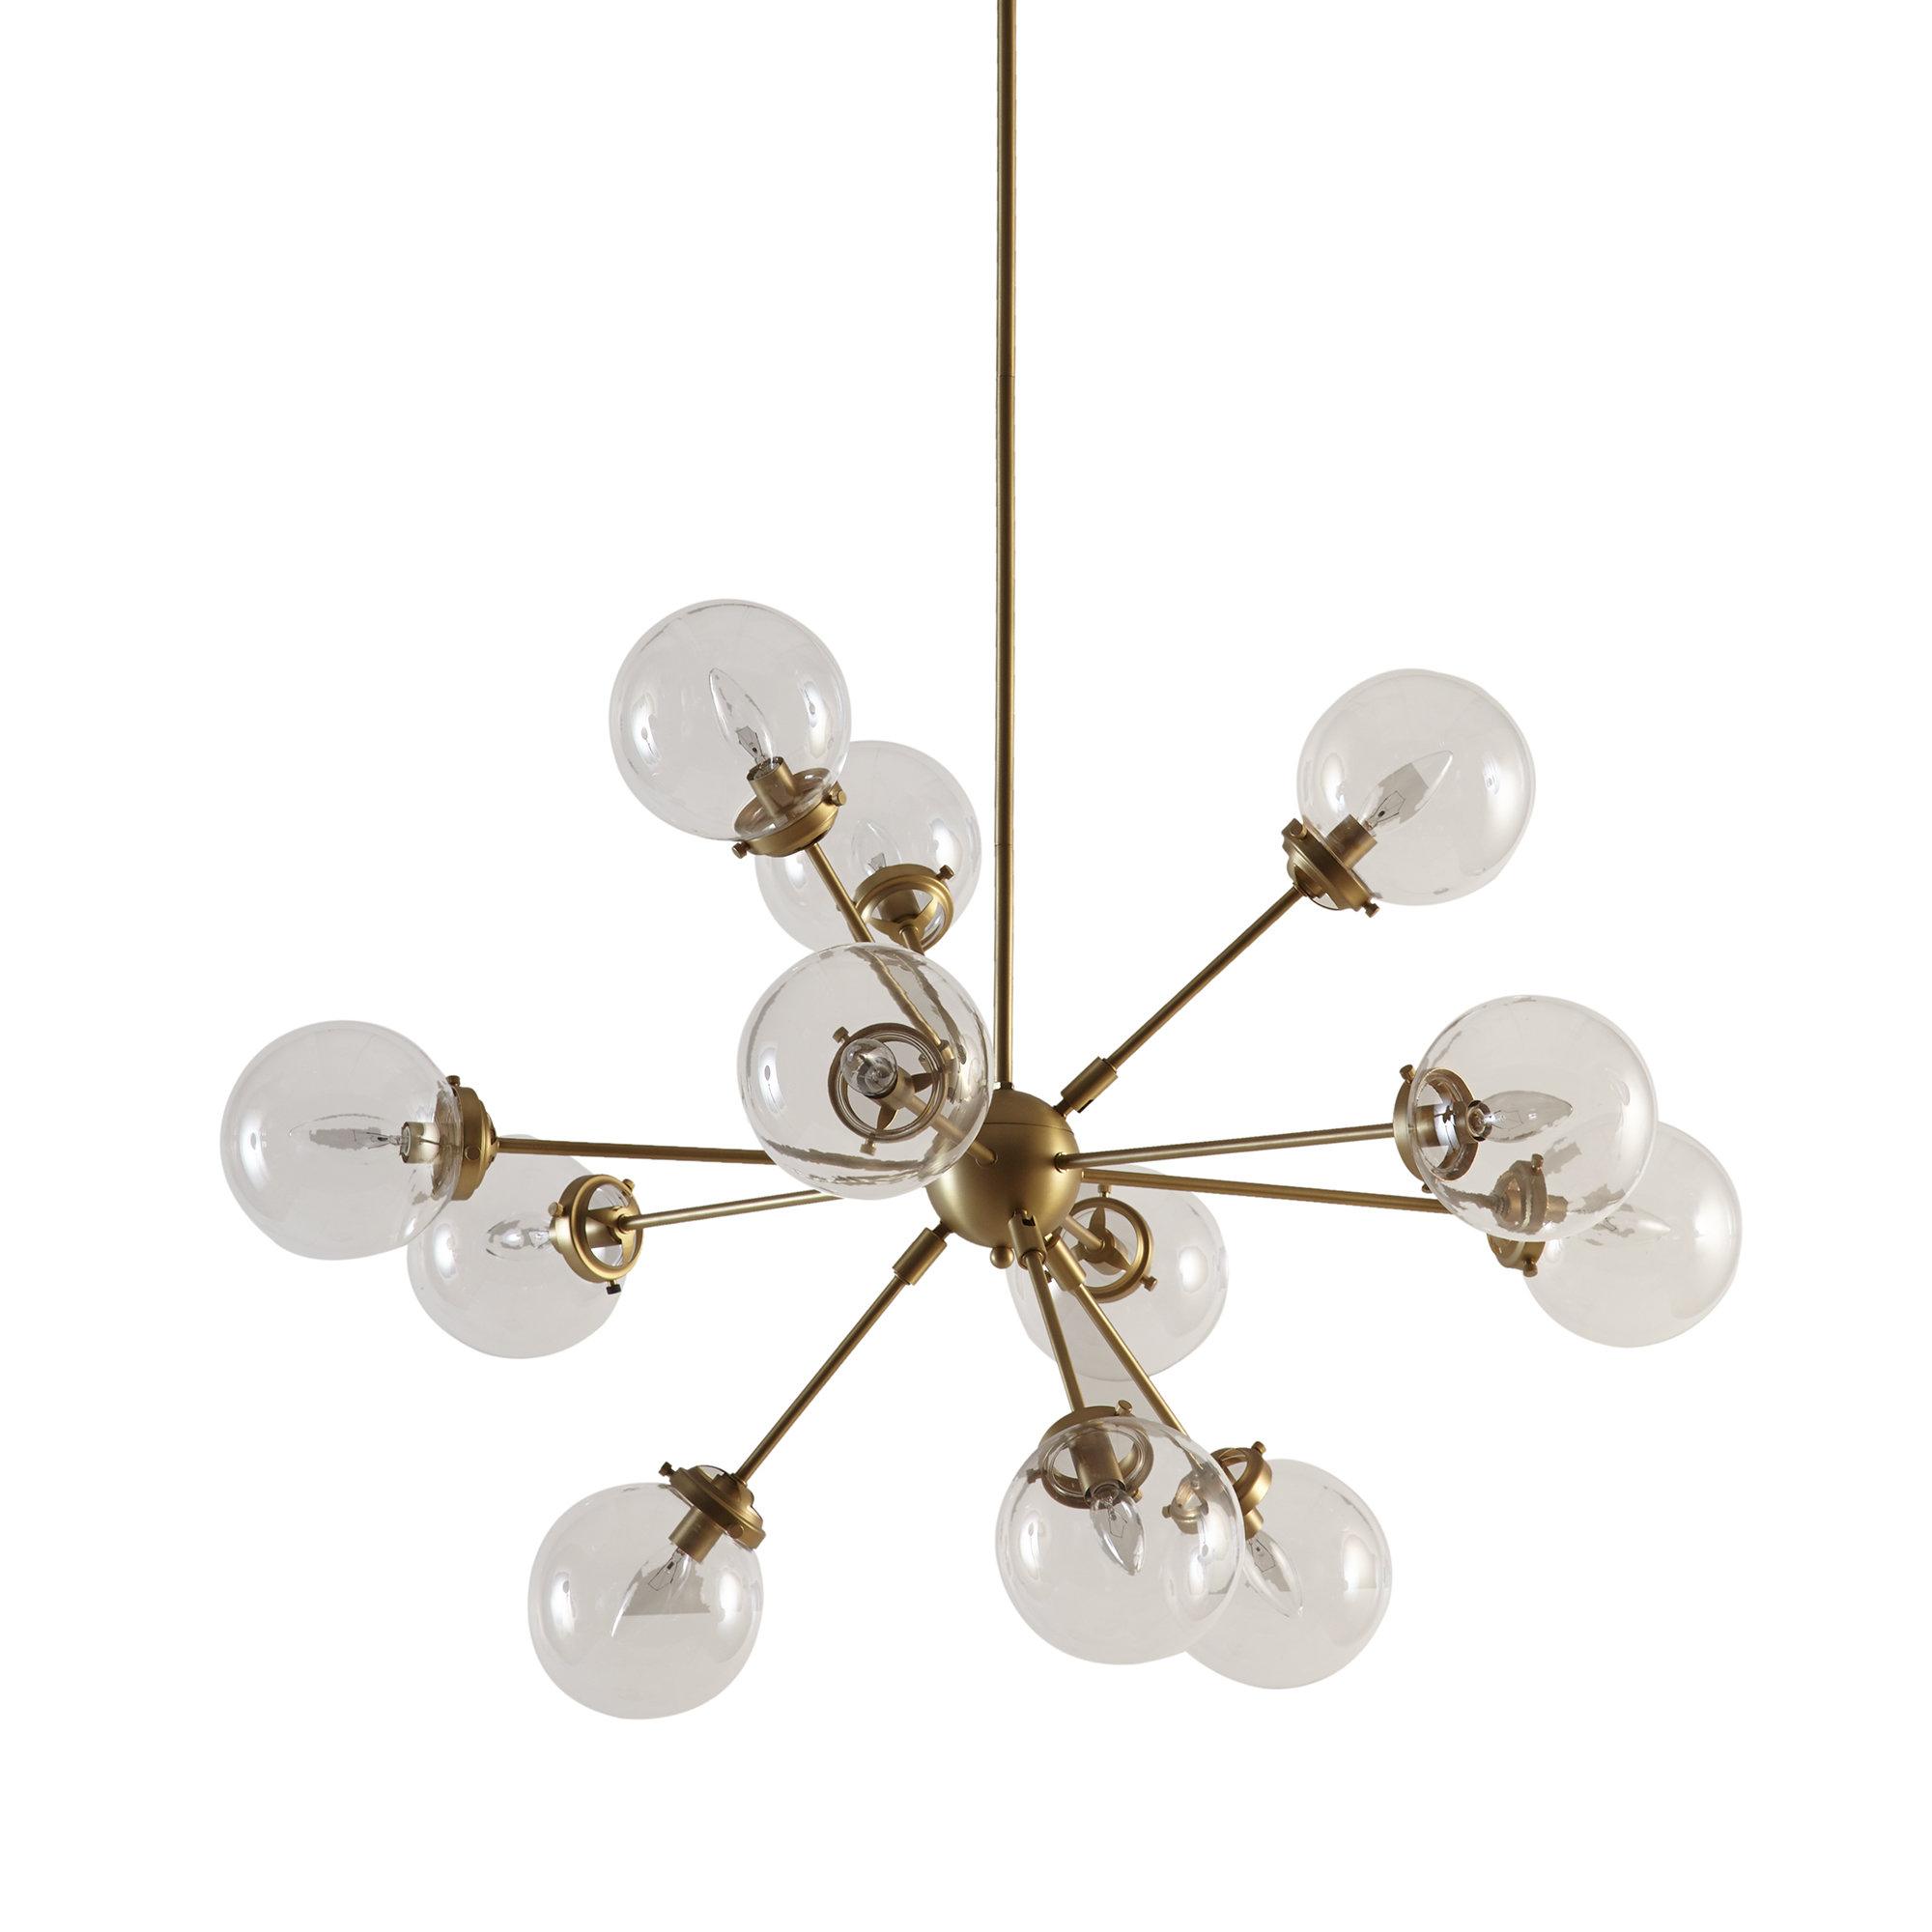 Eastbourne 6-Light Unique / Statement Chandeliers throughout 2019 Modern & Contemporary Gold Geometric Light Fixture